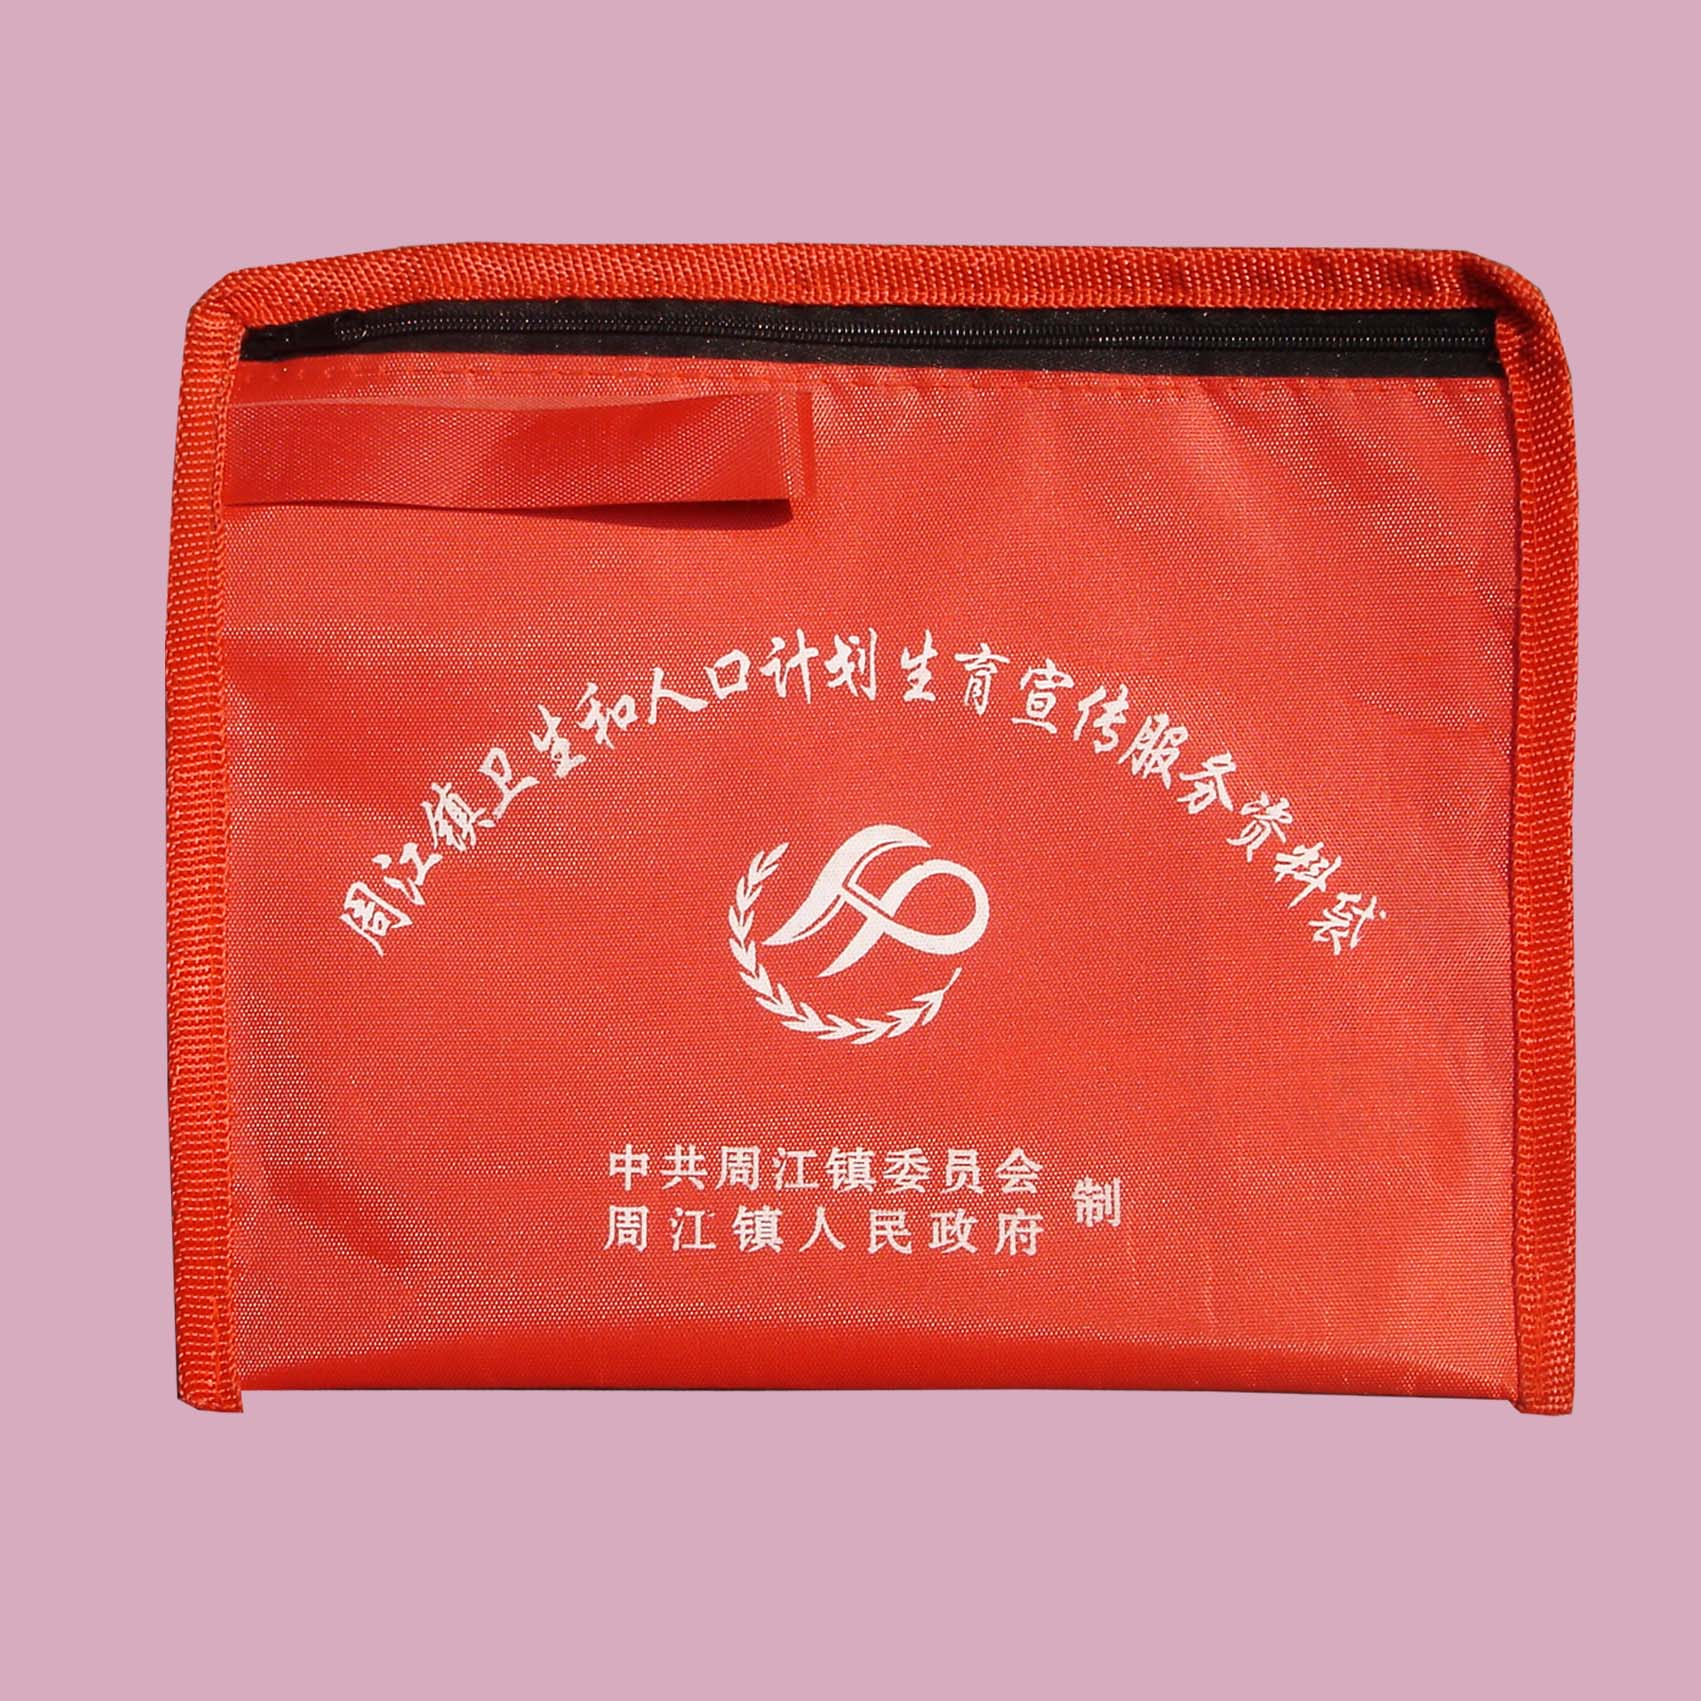 PVC牛津布环保计划生育宣传袋厂